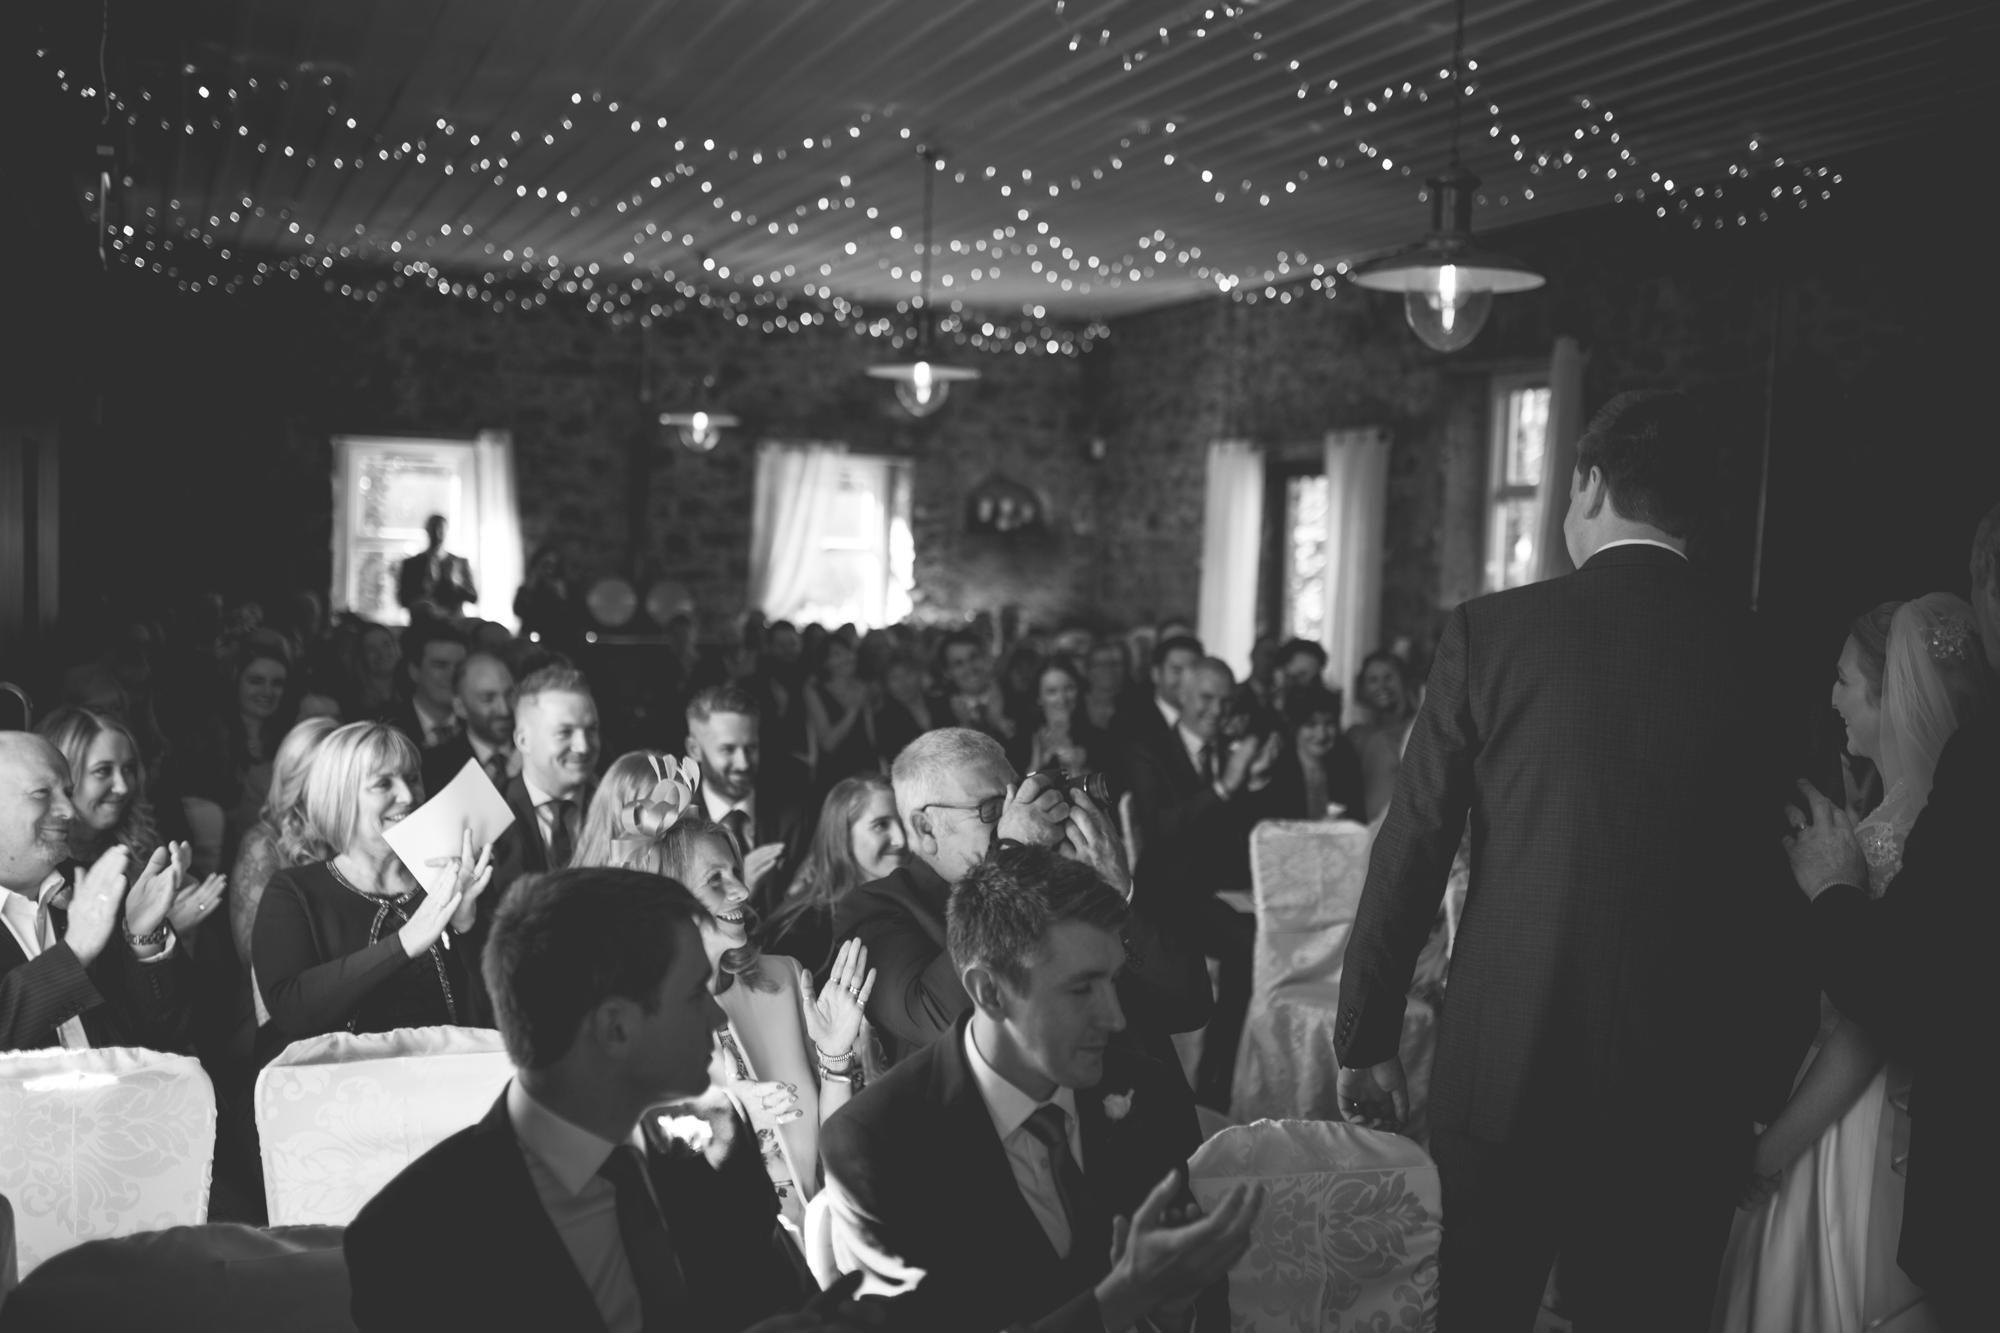 Steve_Emma_Ceremony-125.jpg